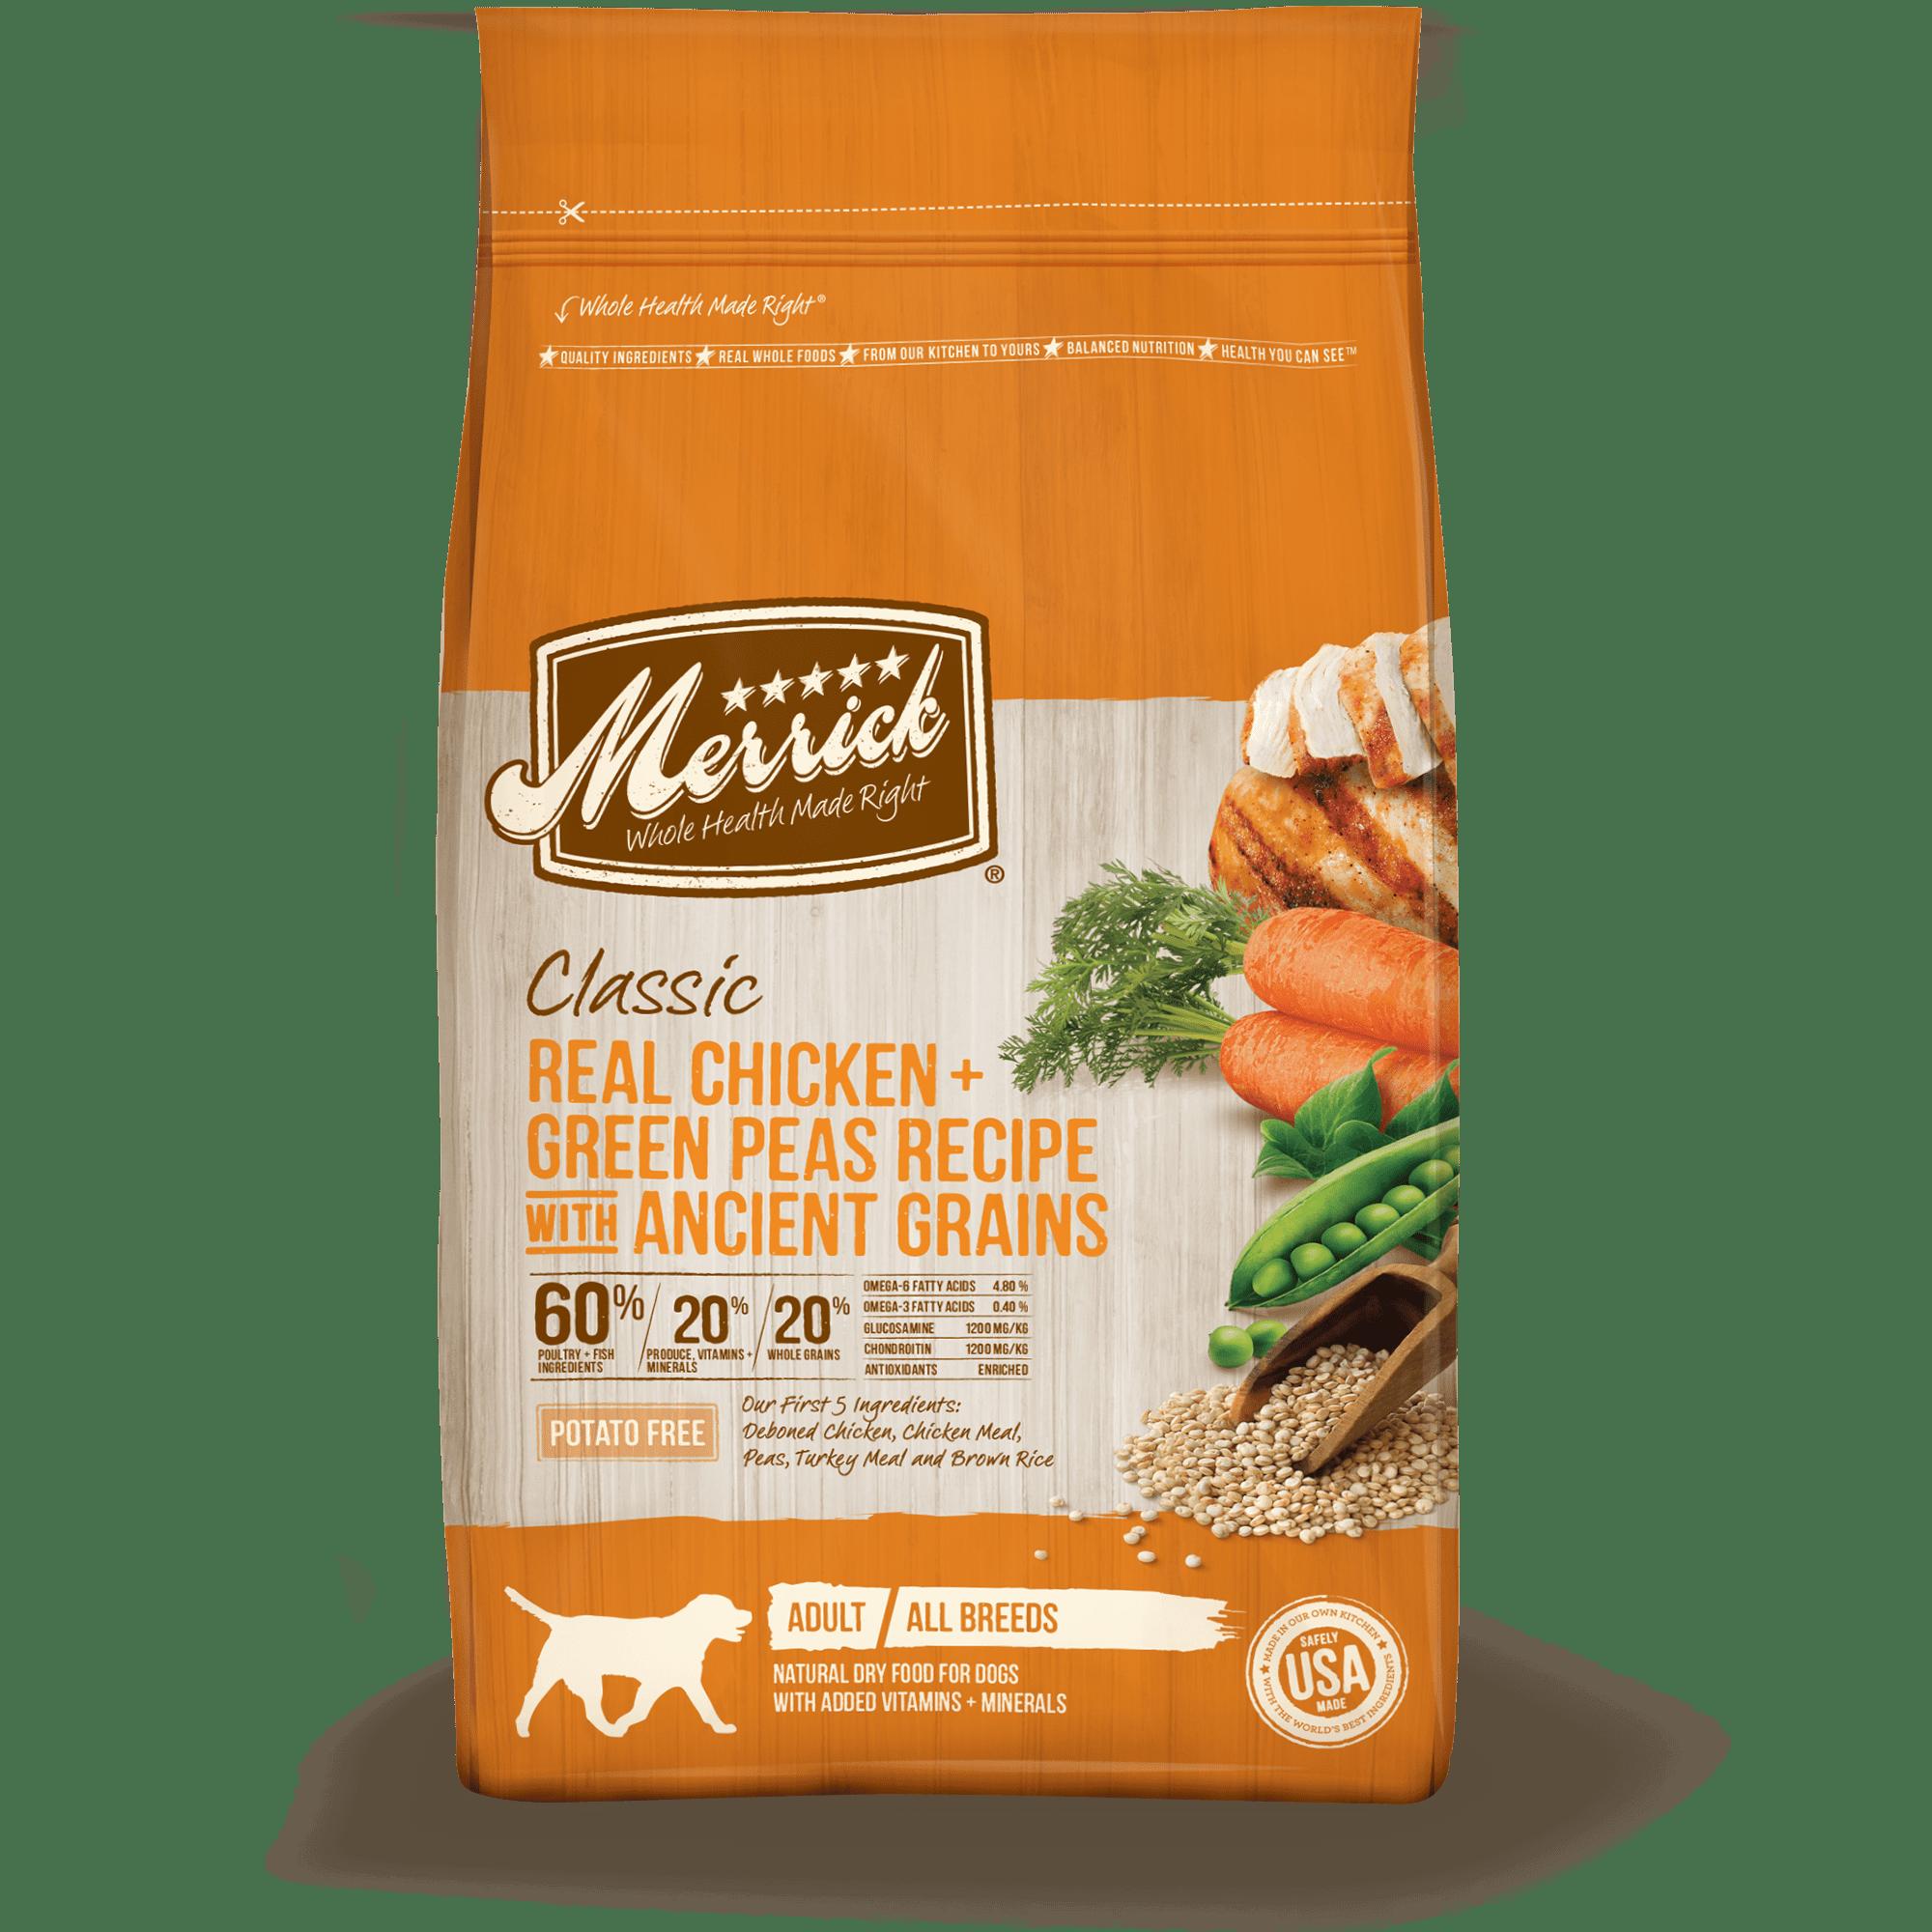 Merrick Classic Real Chicken, Green Peas + Ancient Grains Dry Dog Food, 25 lb